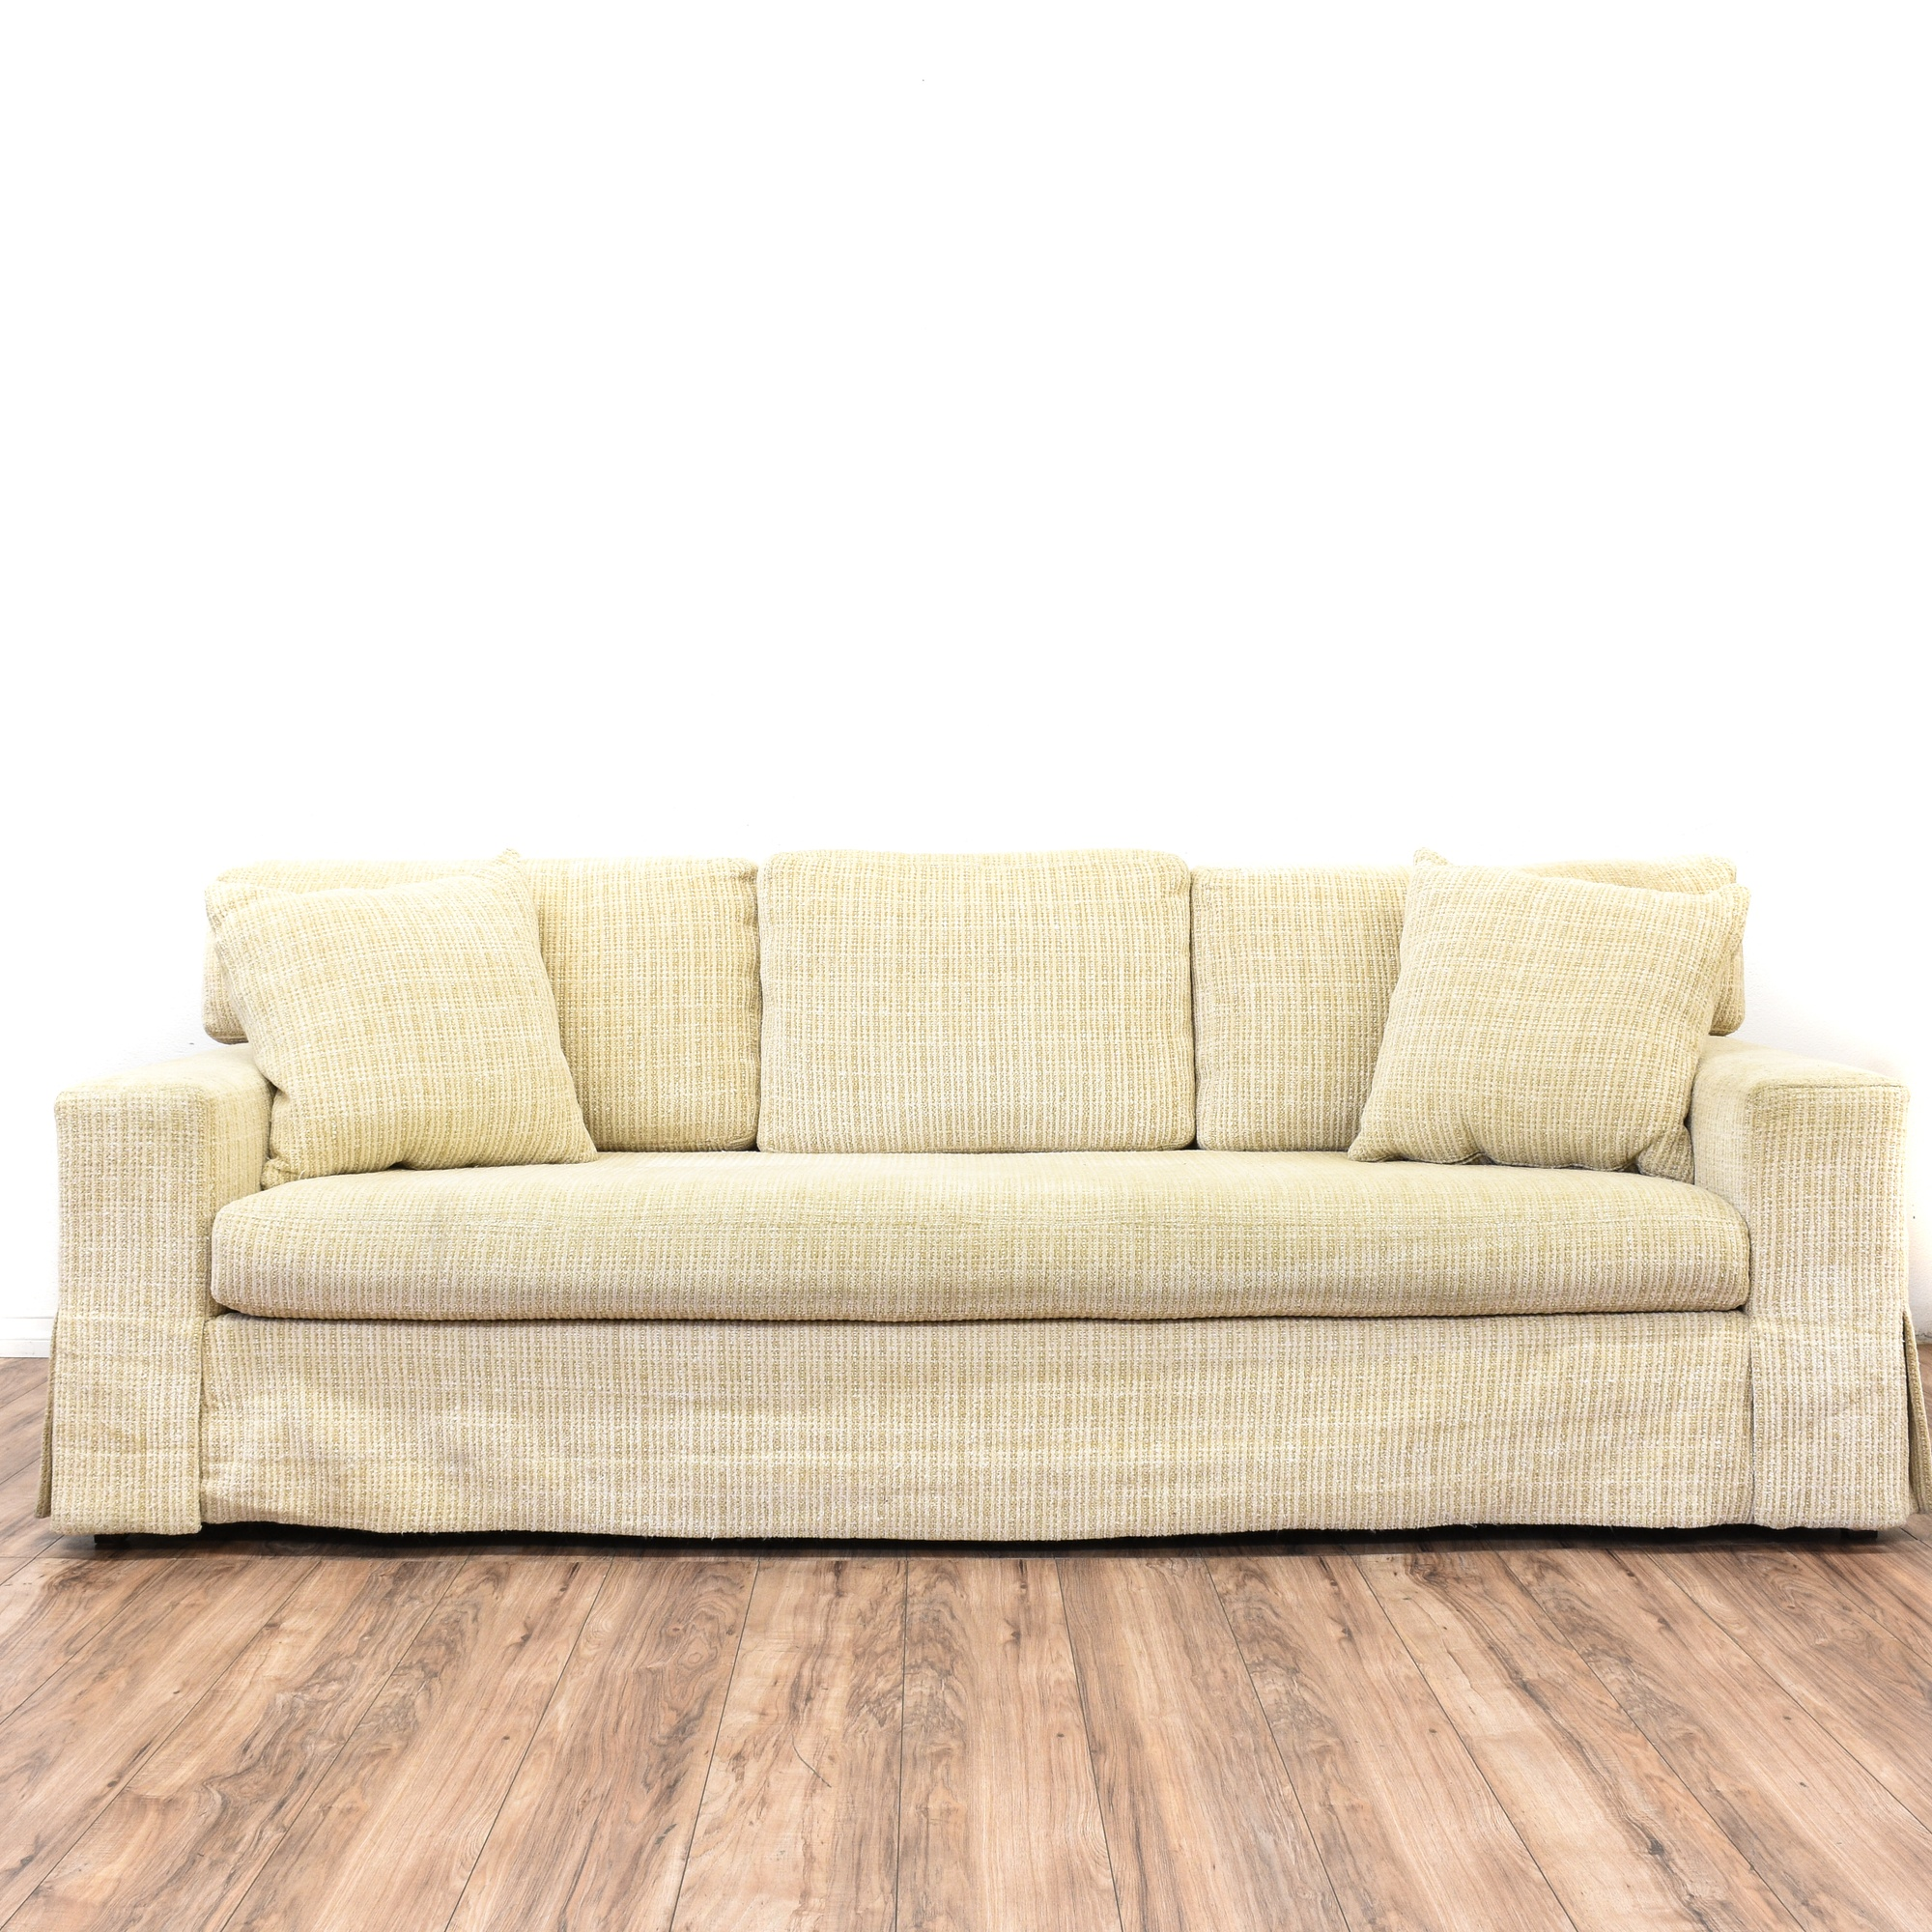 Contemporary Beige Textured Sofa